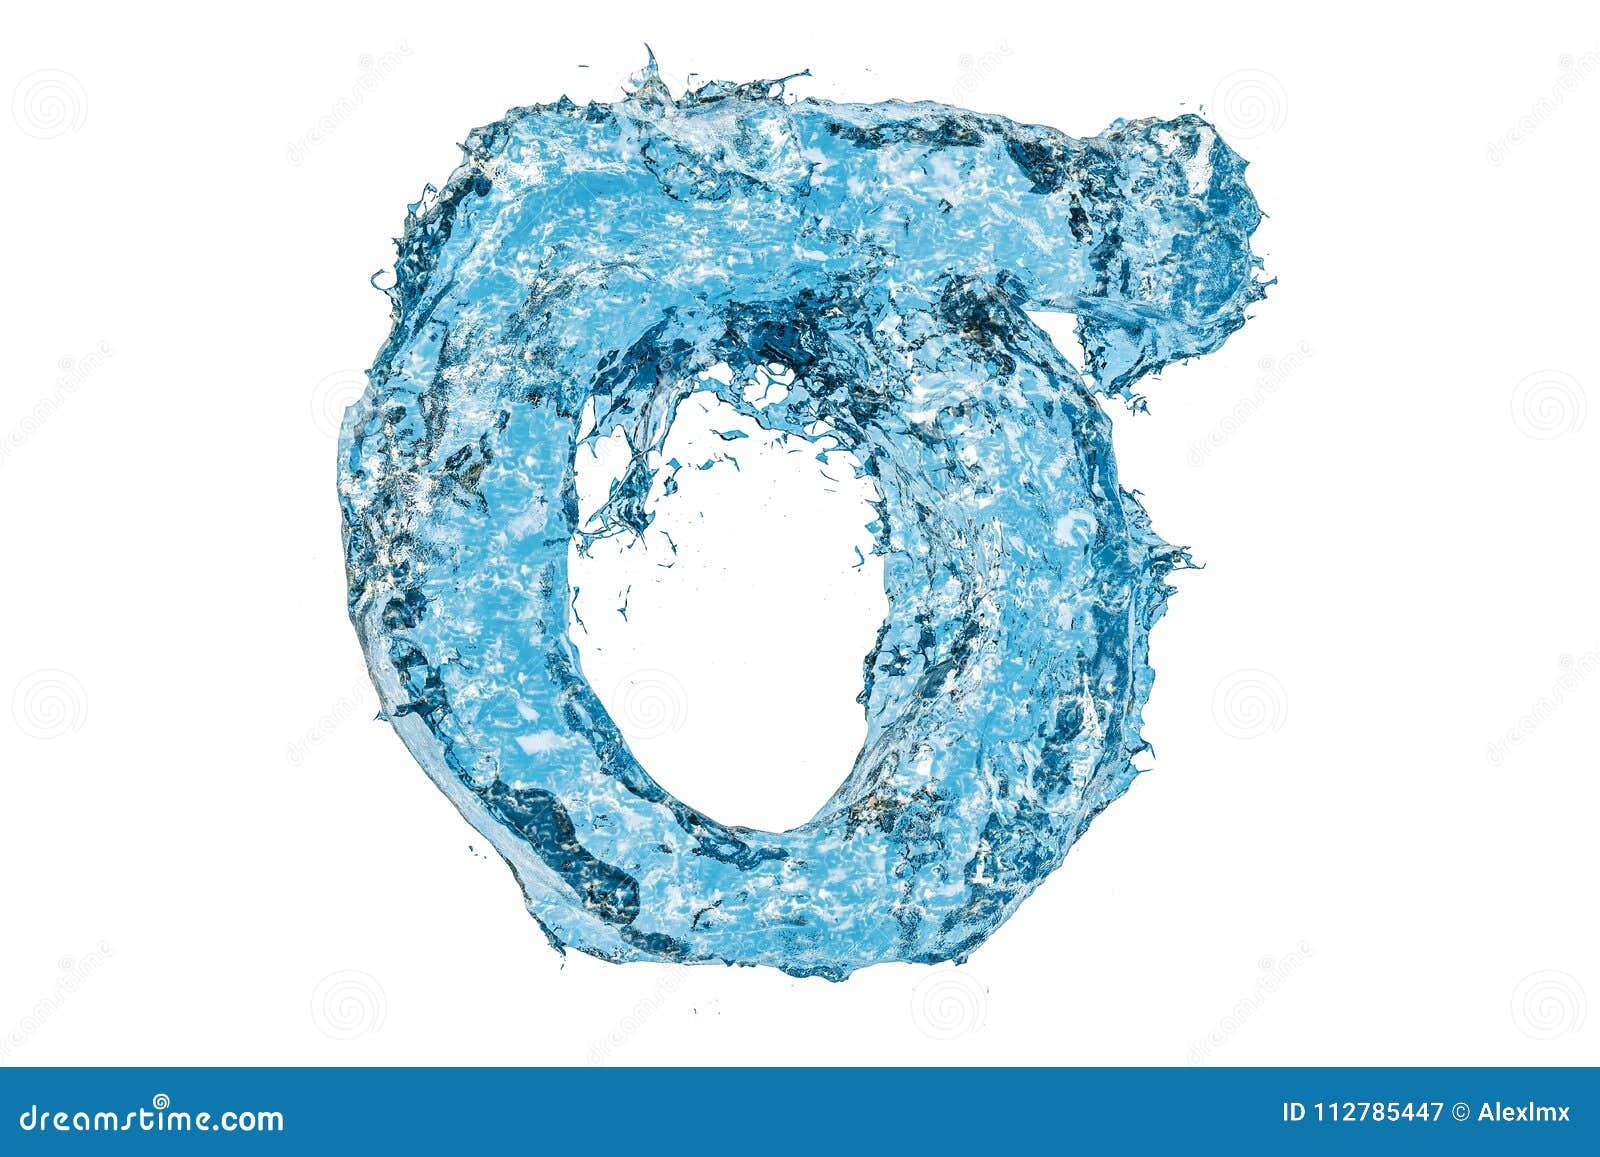 Water Greek Letter Sigma 3d Rendering Stock Illustration